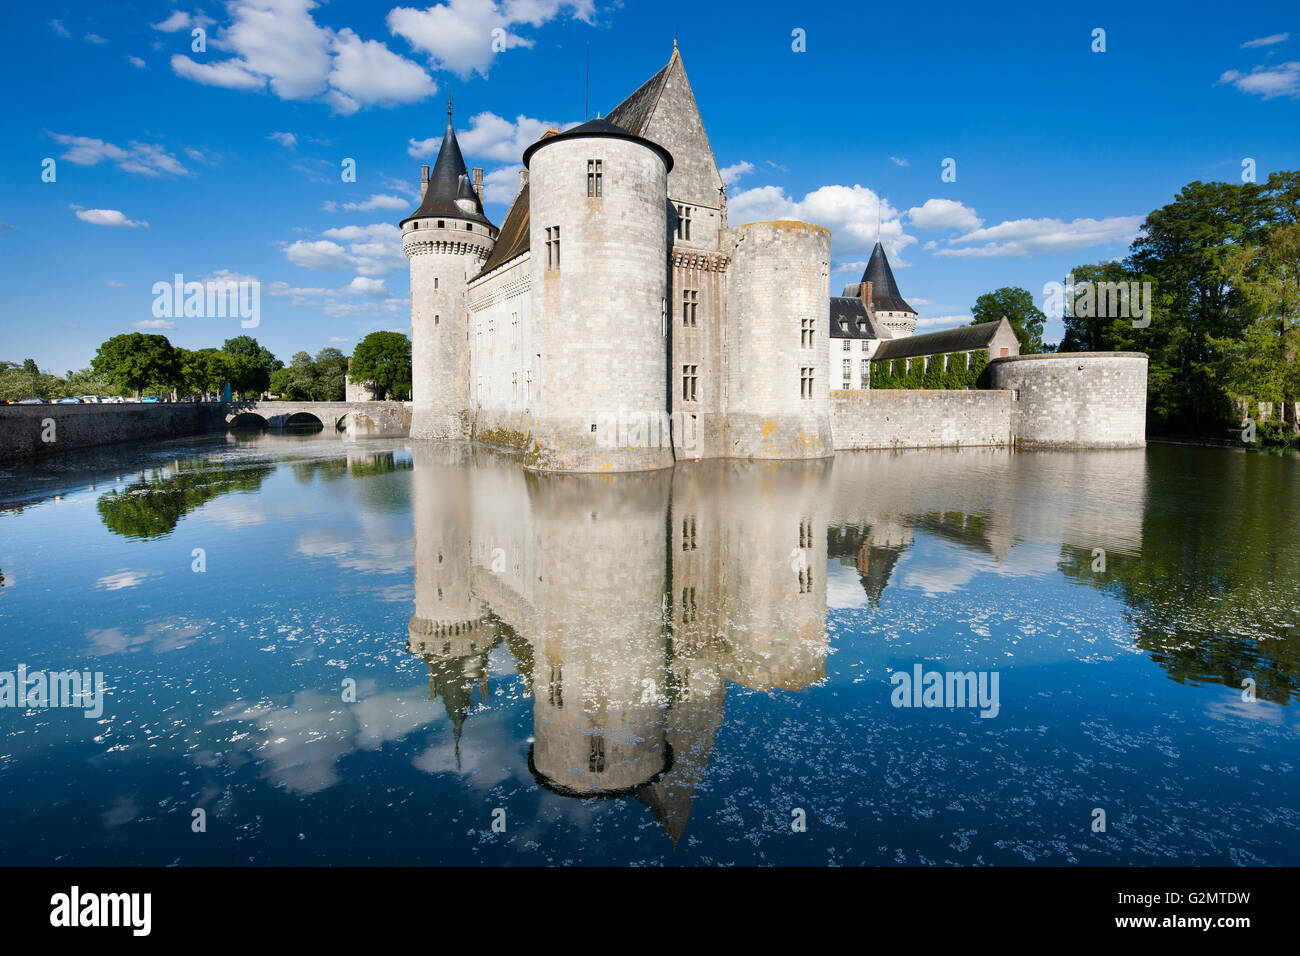 Moated castle, Castle Sully, Sully-sur-Loire, Loiret, Centre Region, France - Stock Image